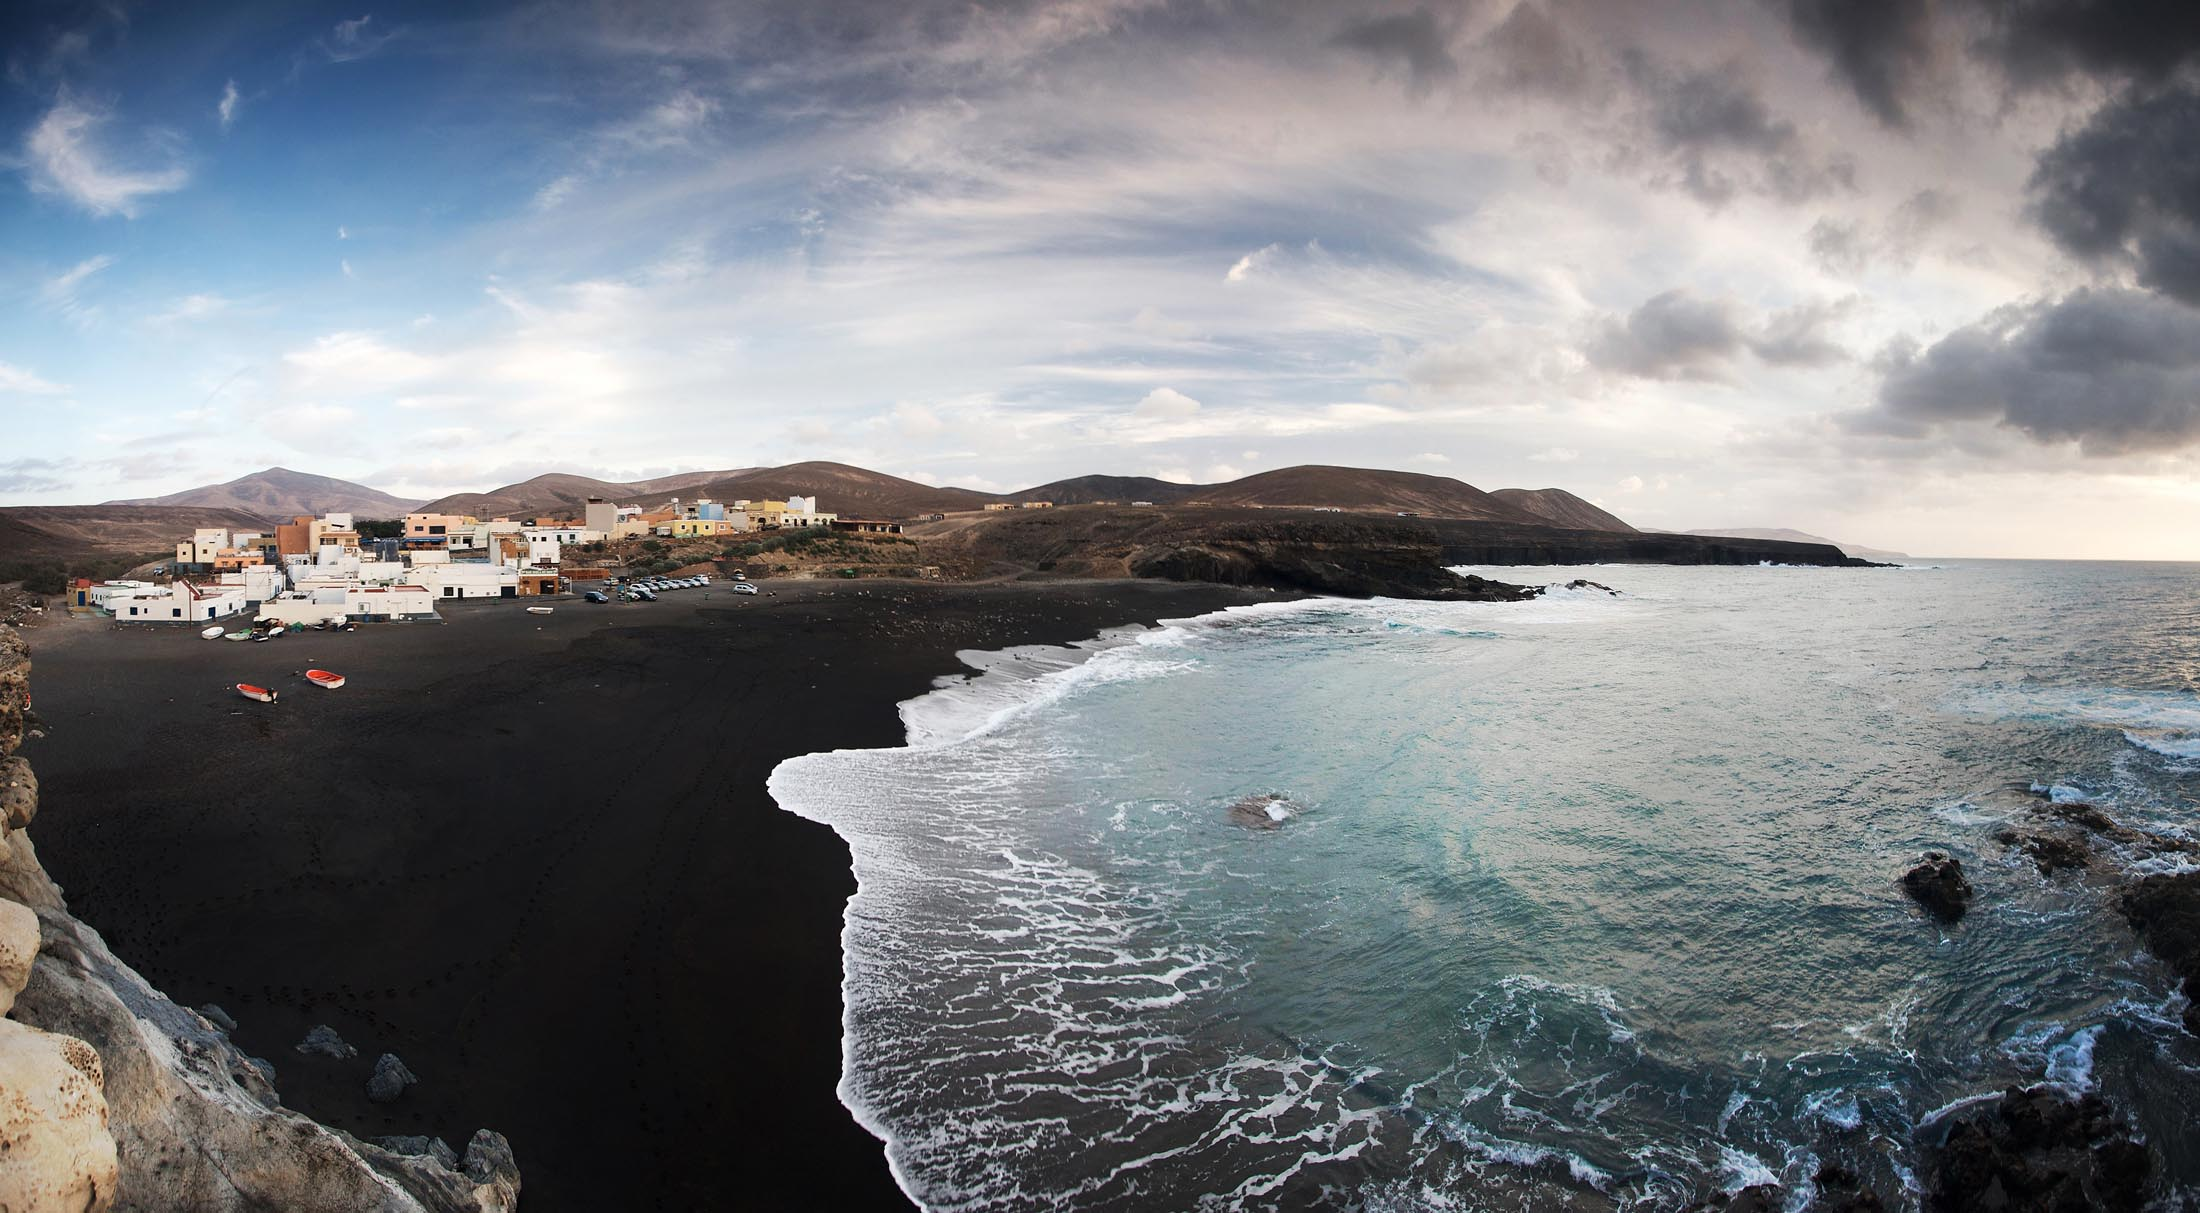 Playa Negro, Fuerteventura